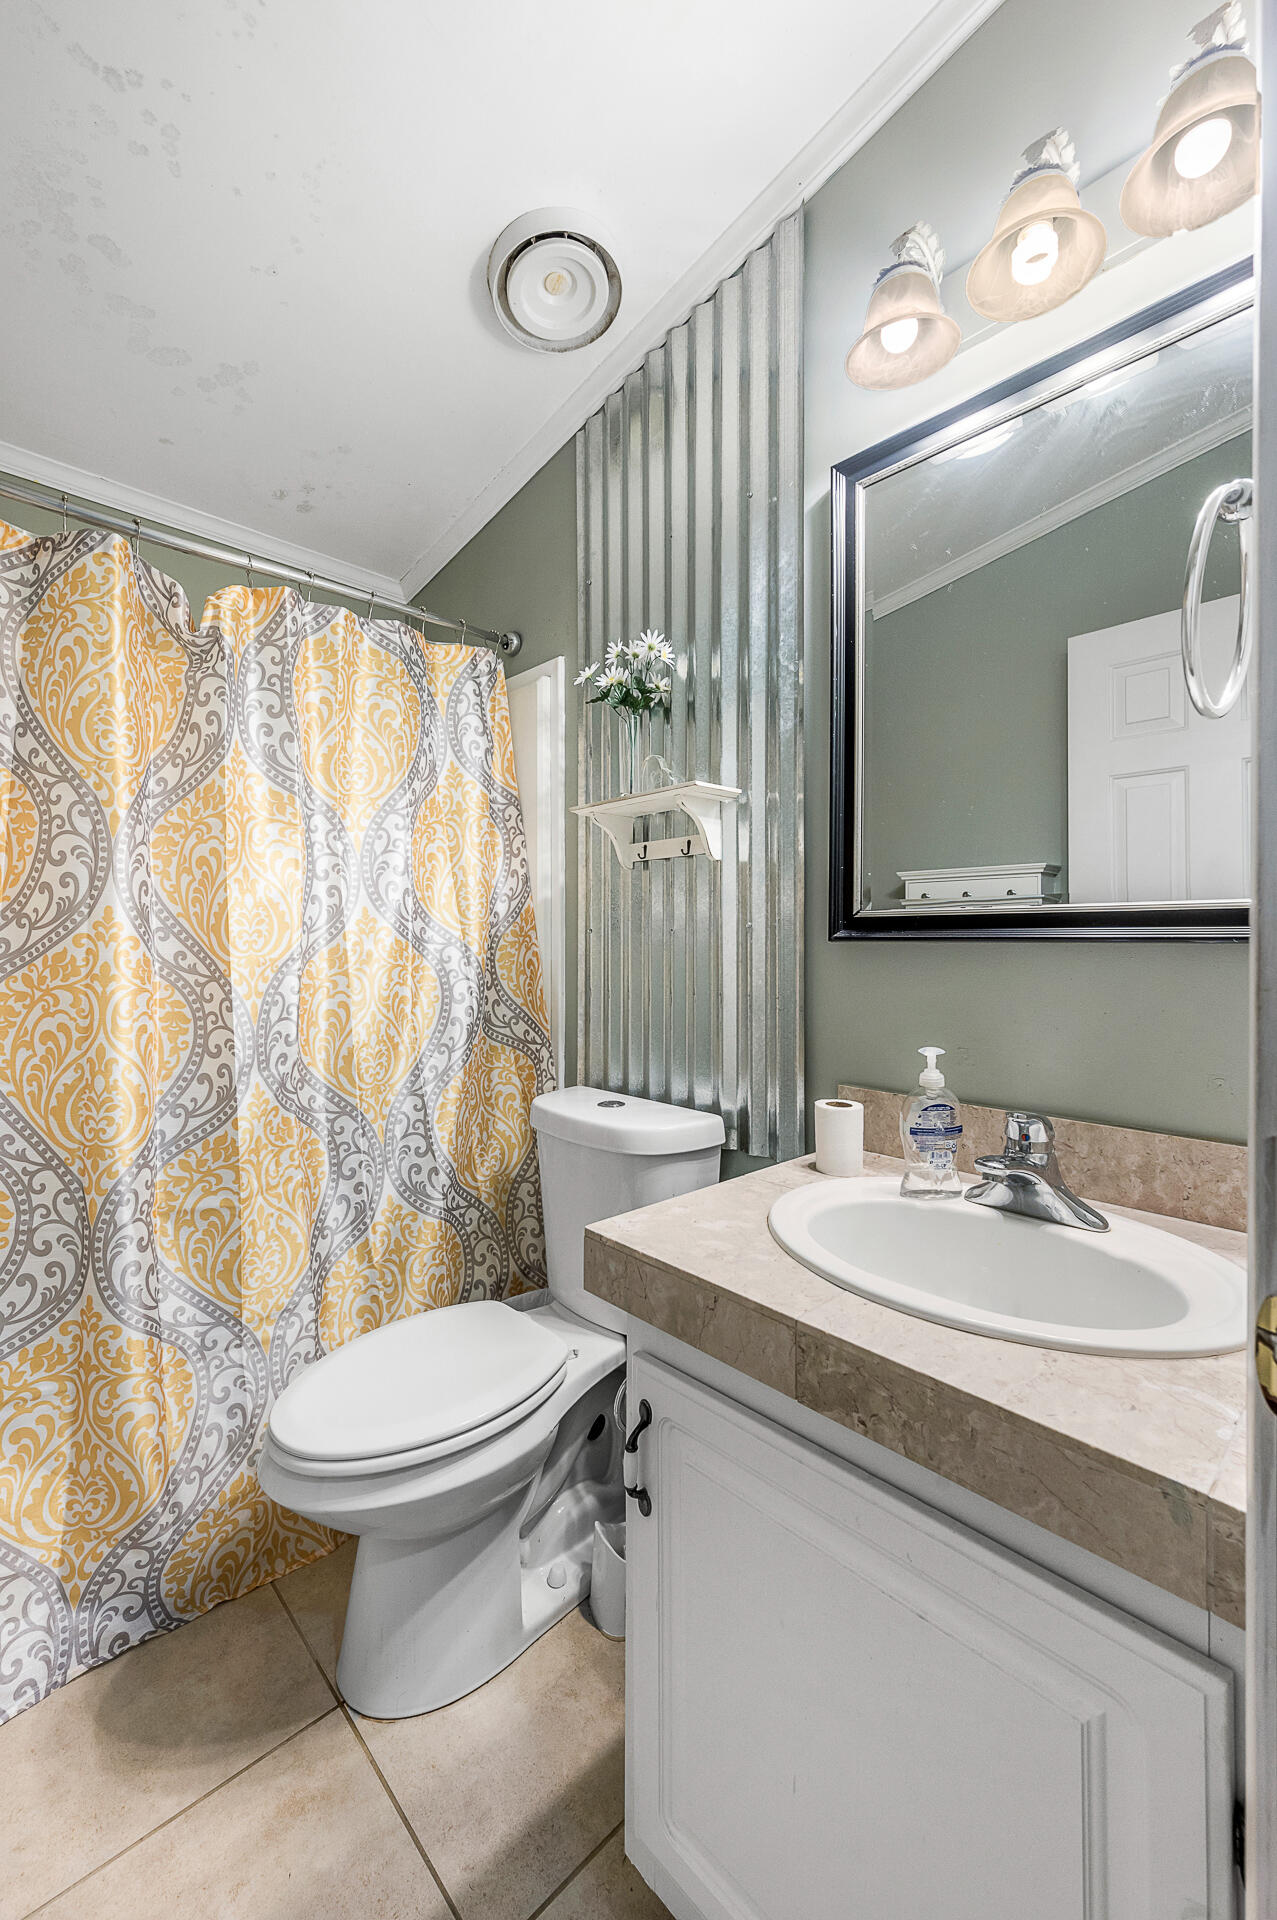 Clemson Terrace Homes For Sale - 250 Medina, Summerville, SC - 14